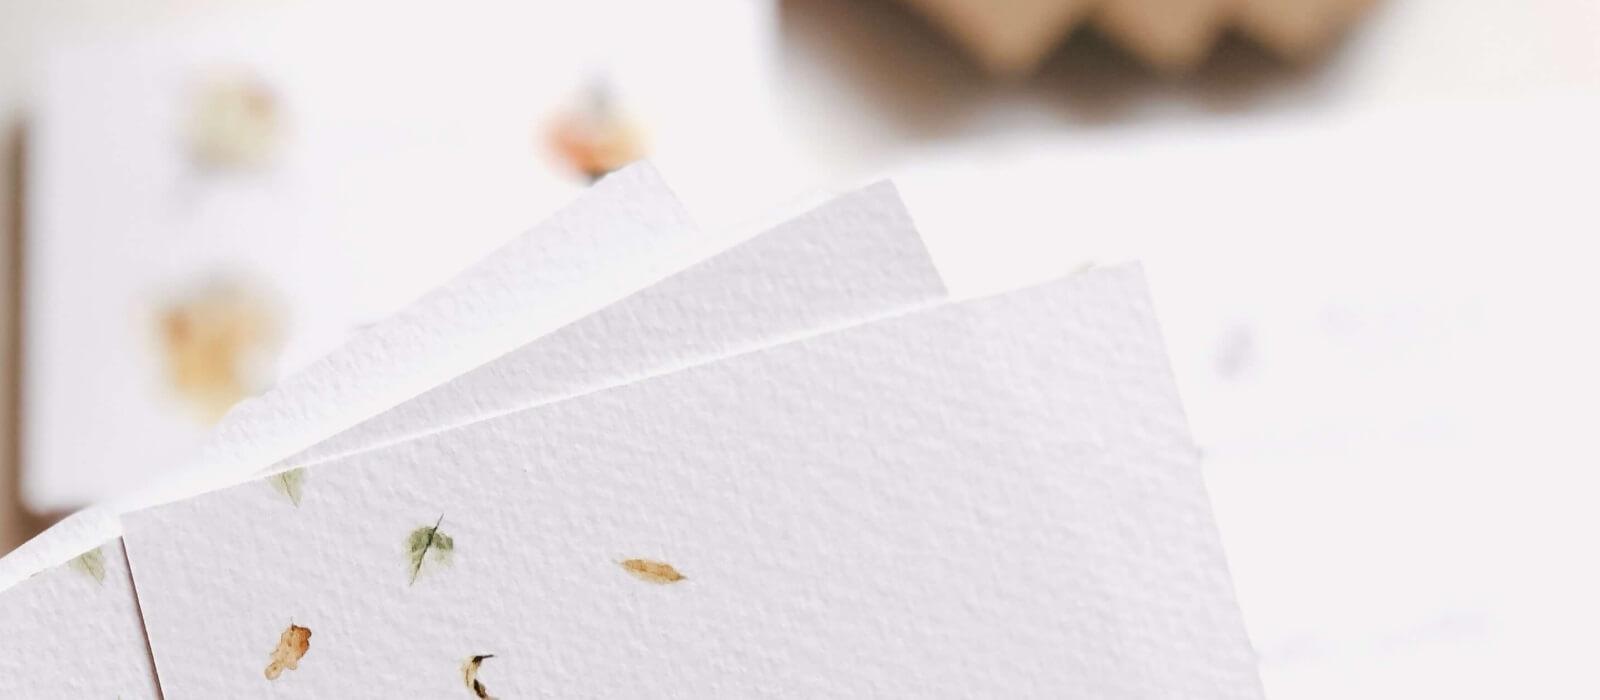 wielka letnia promocja -15% design your wedding _ rabat_